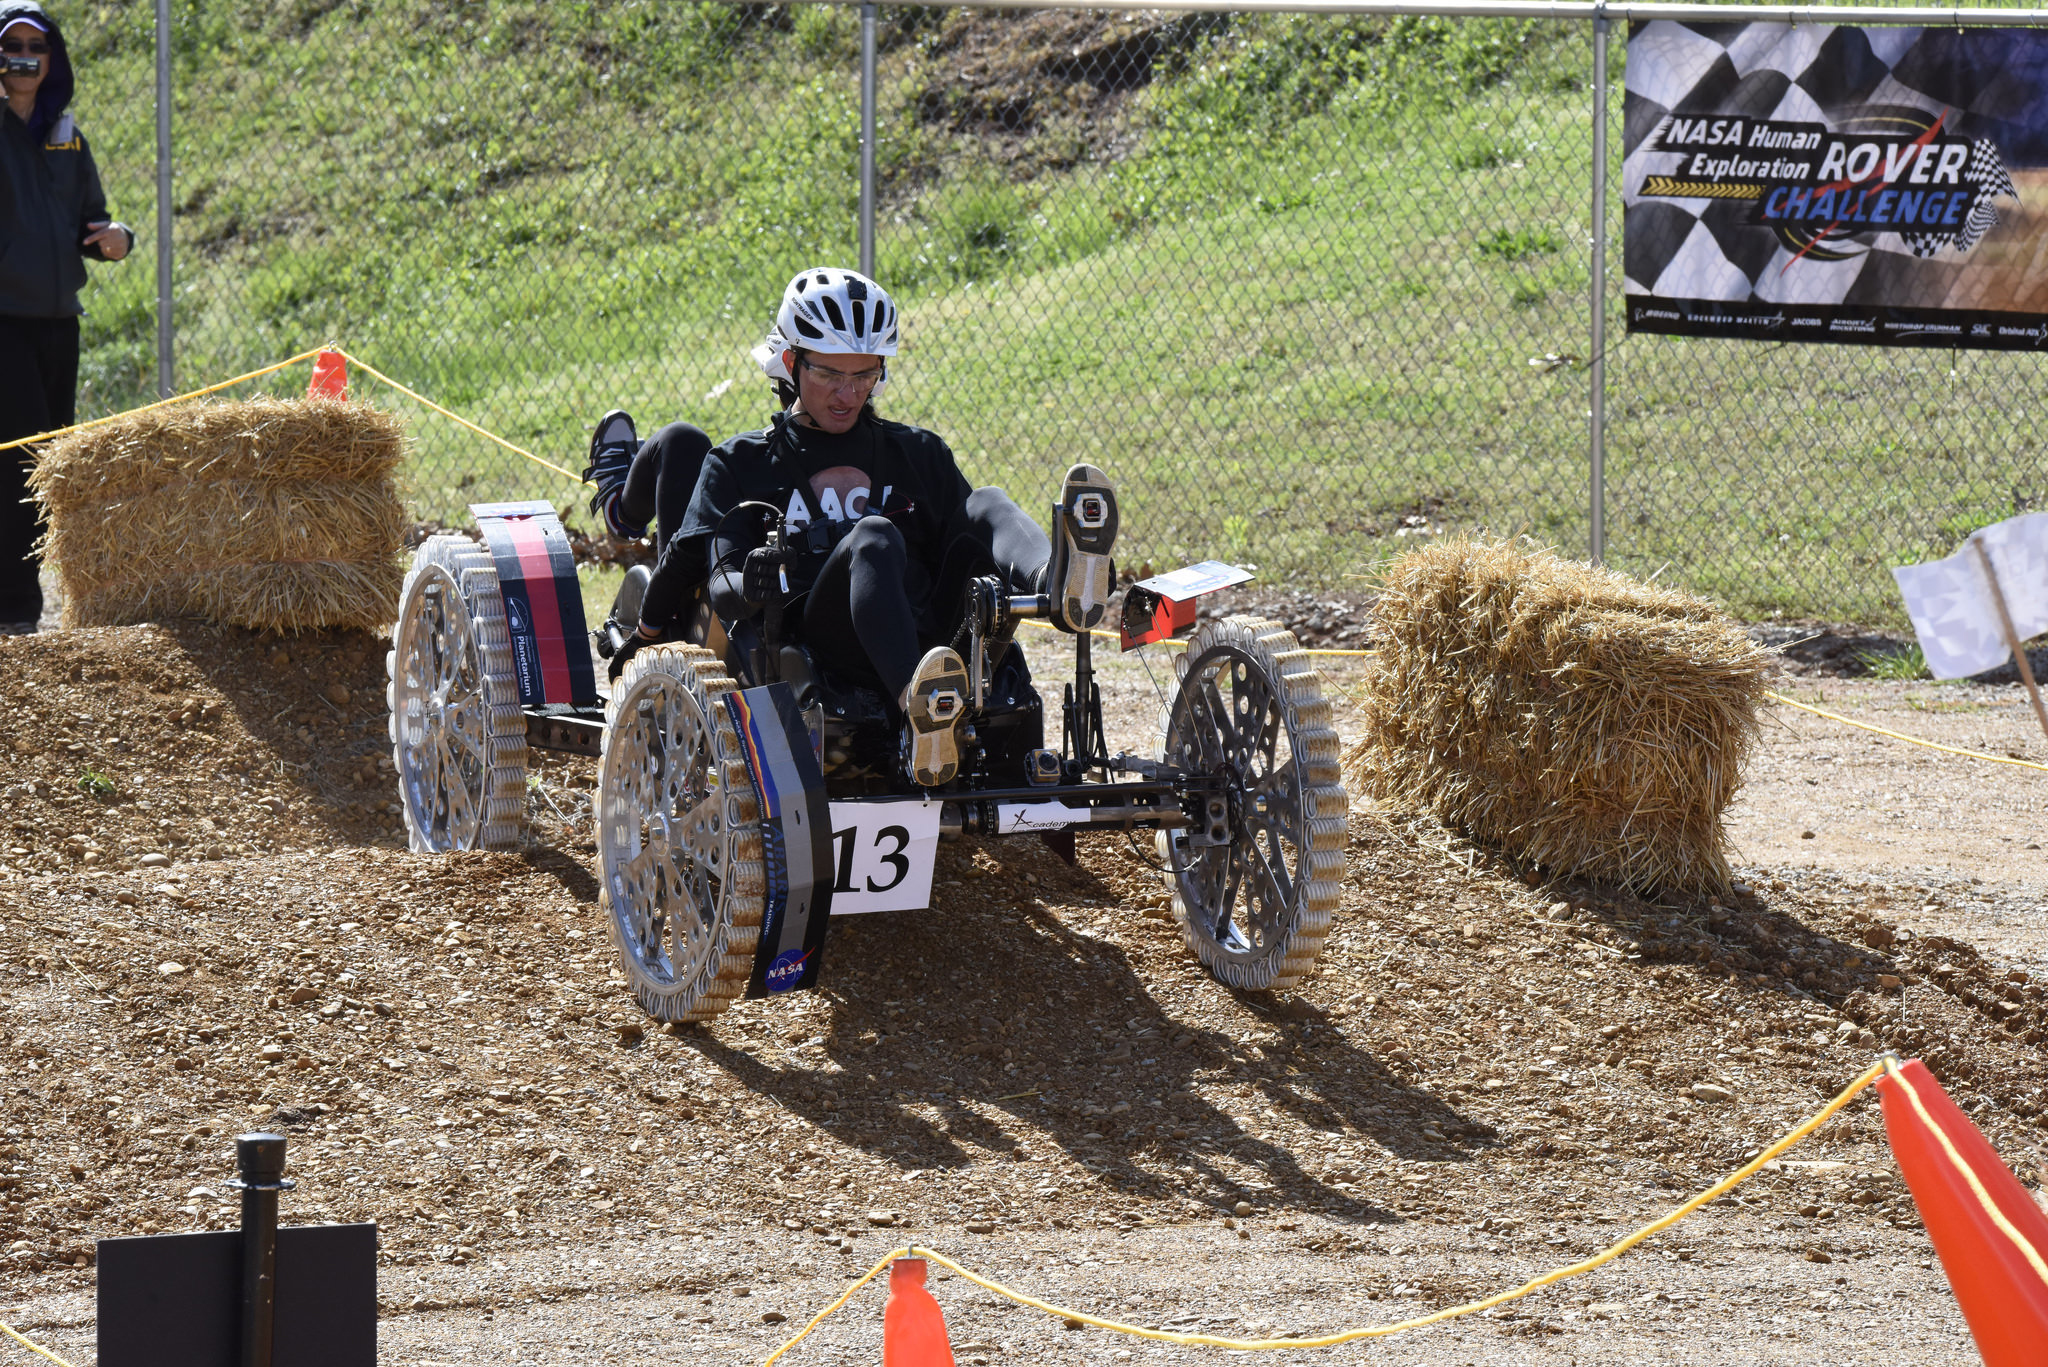 mars rover technical challenge - photo #21